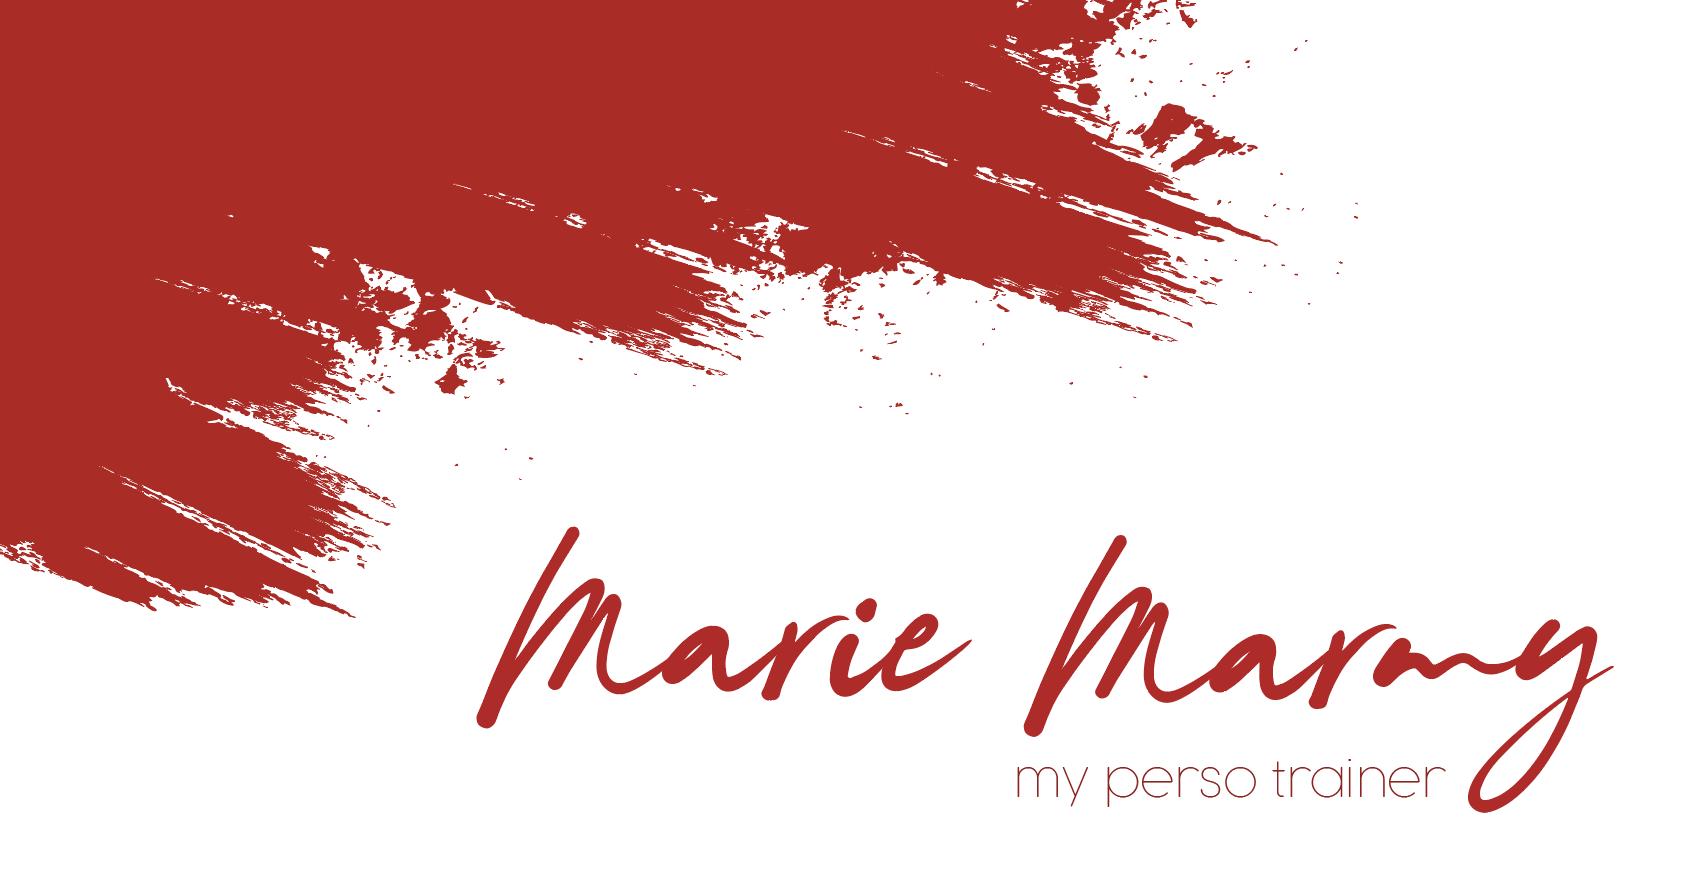 Proposition de logo Marie Marmy - création Myriam Ramel.png